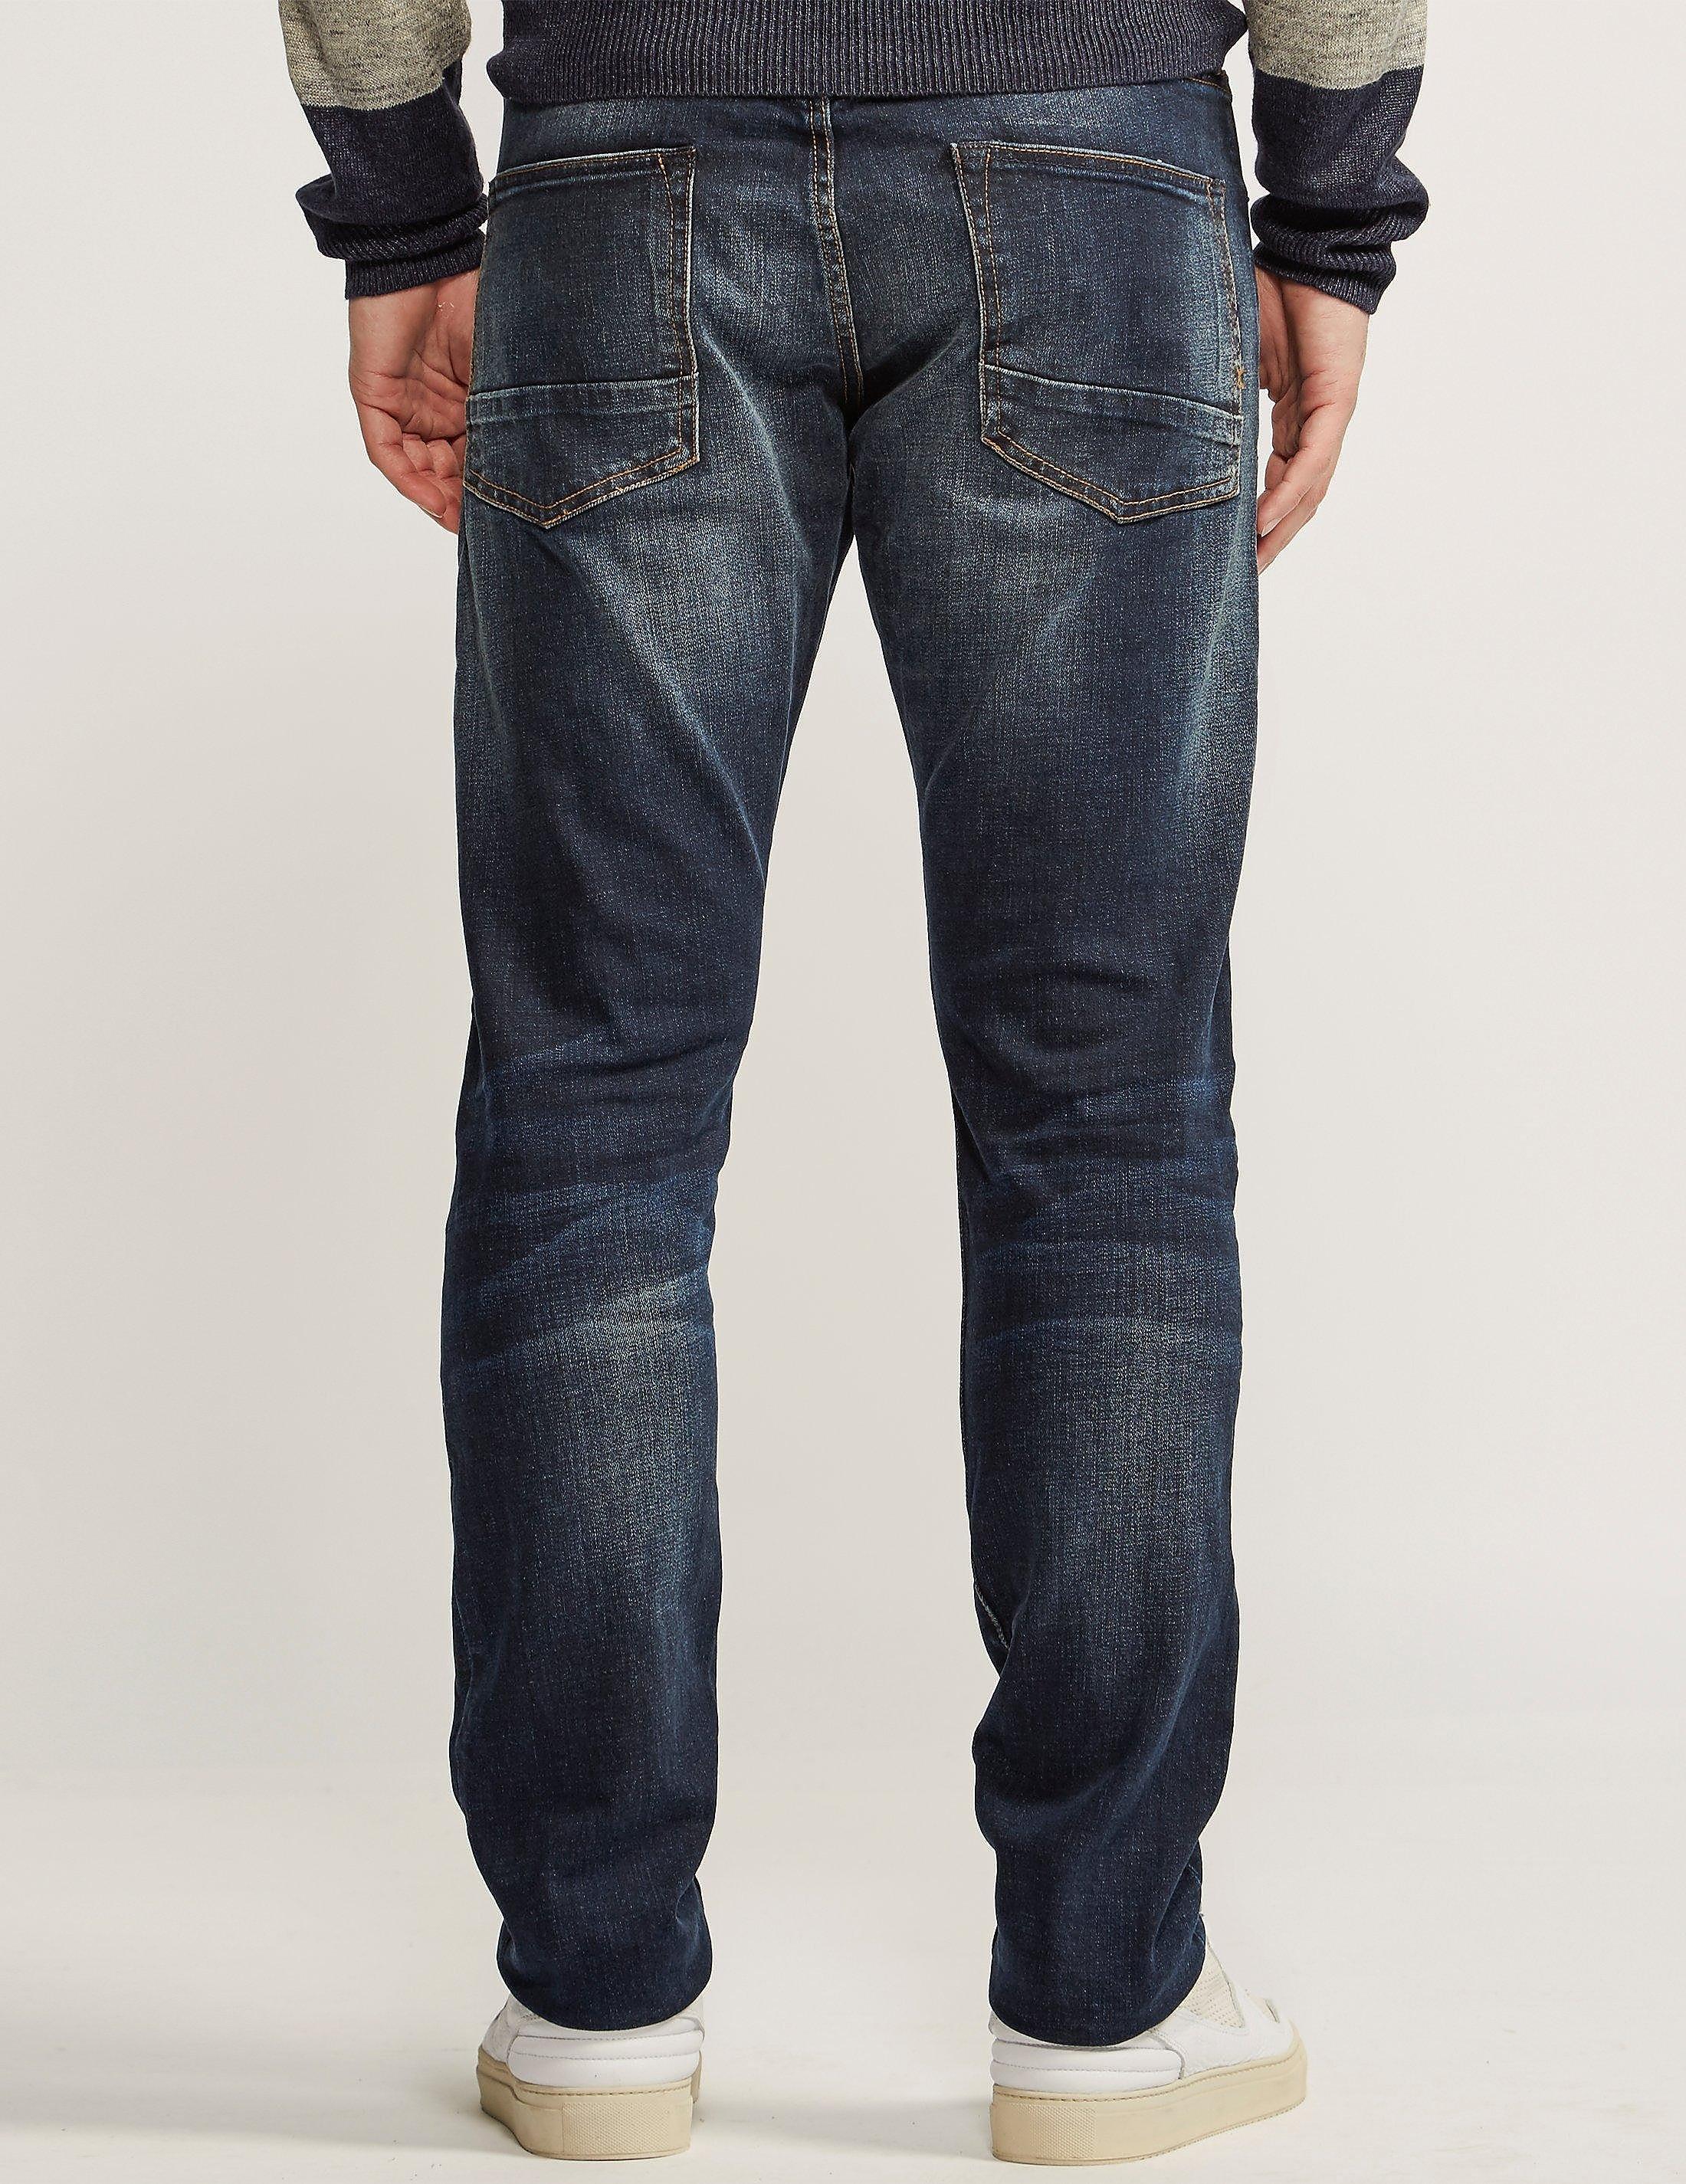 Scotch & Soda Ralston Dawn To Dusk Regular Fit Jeans